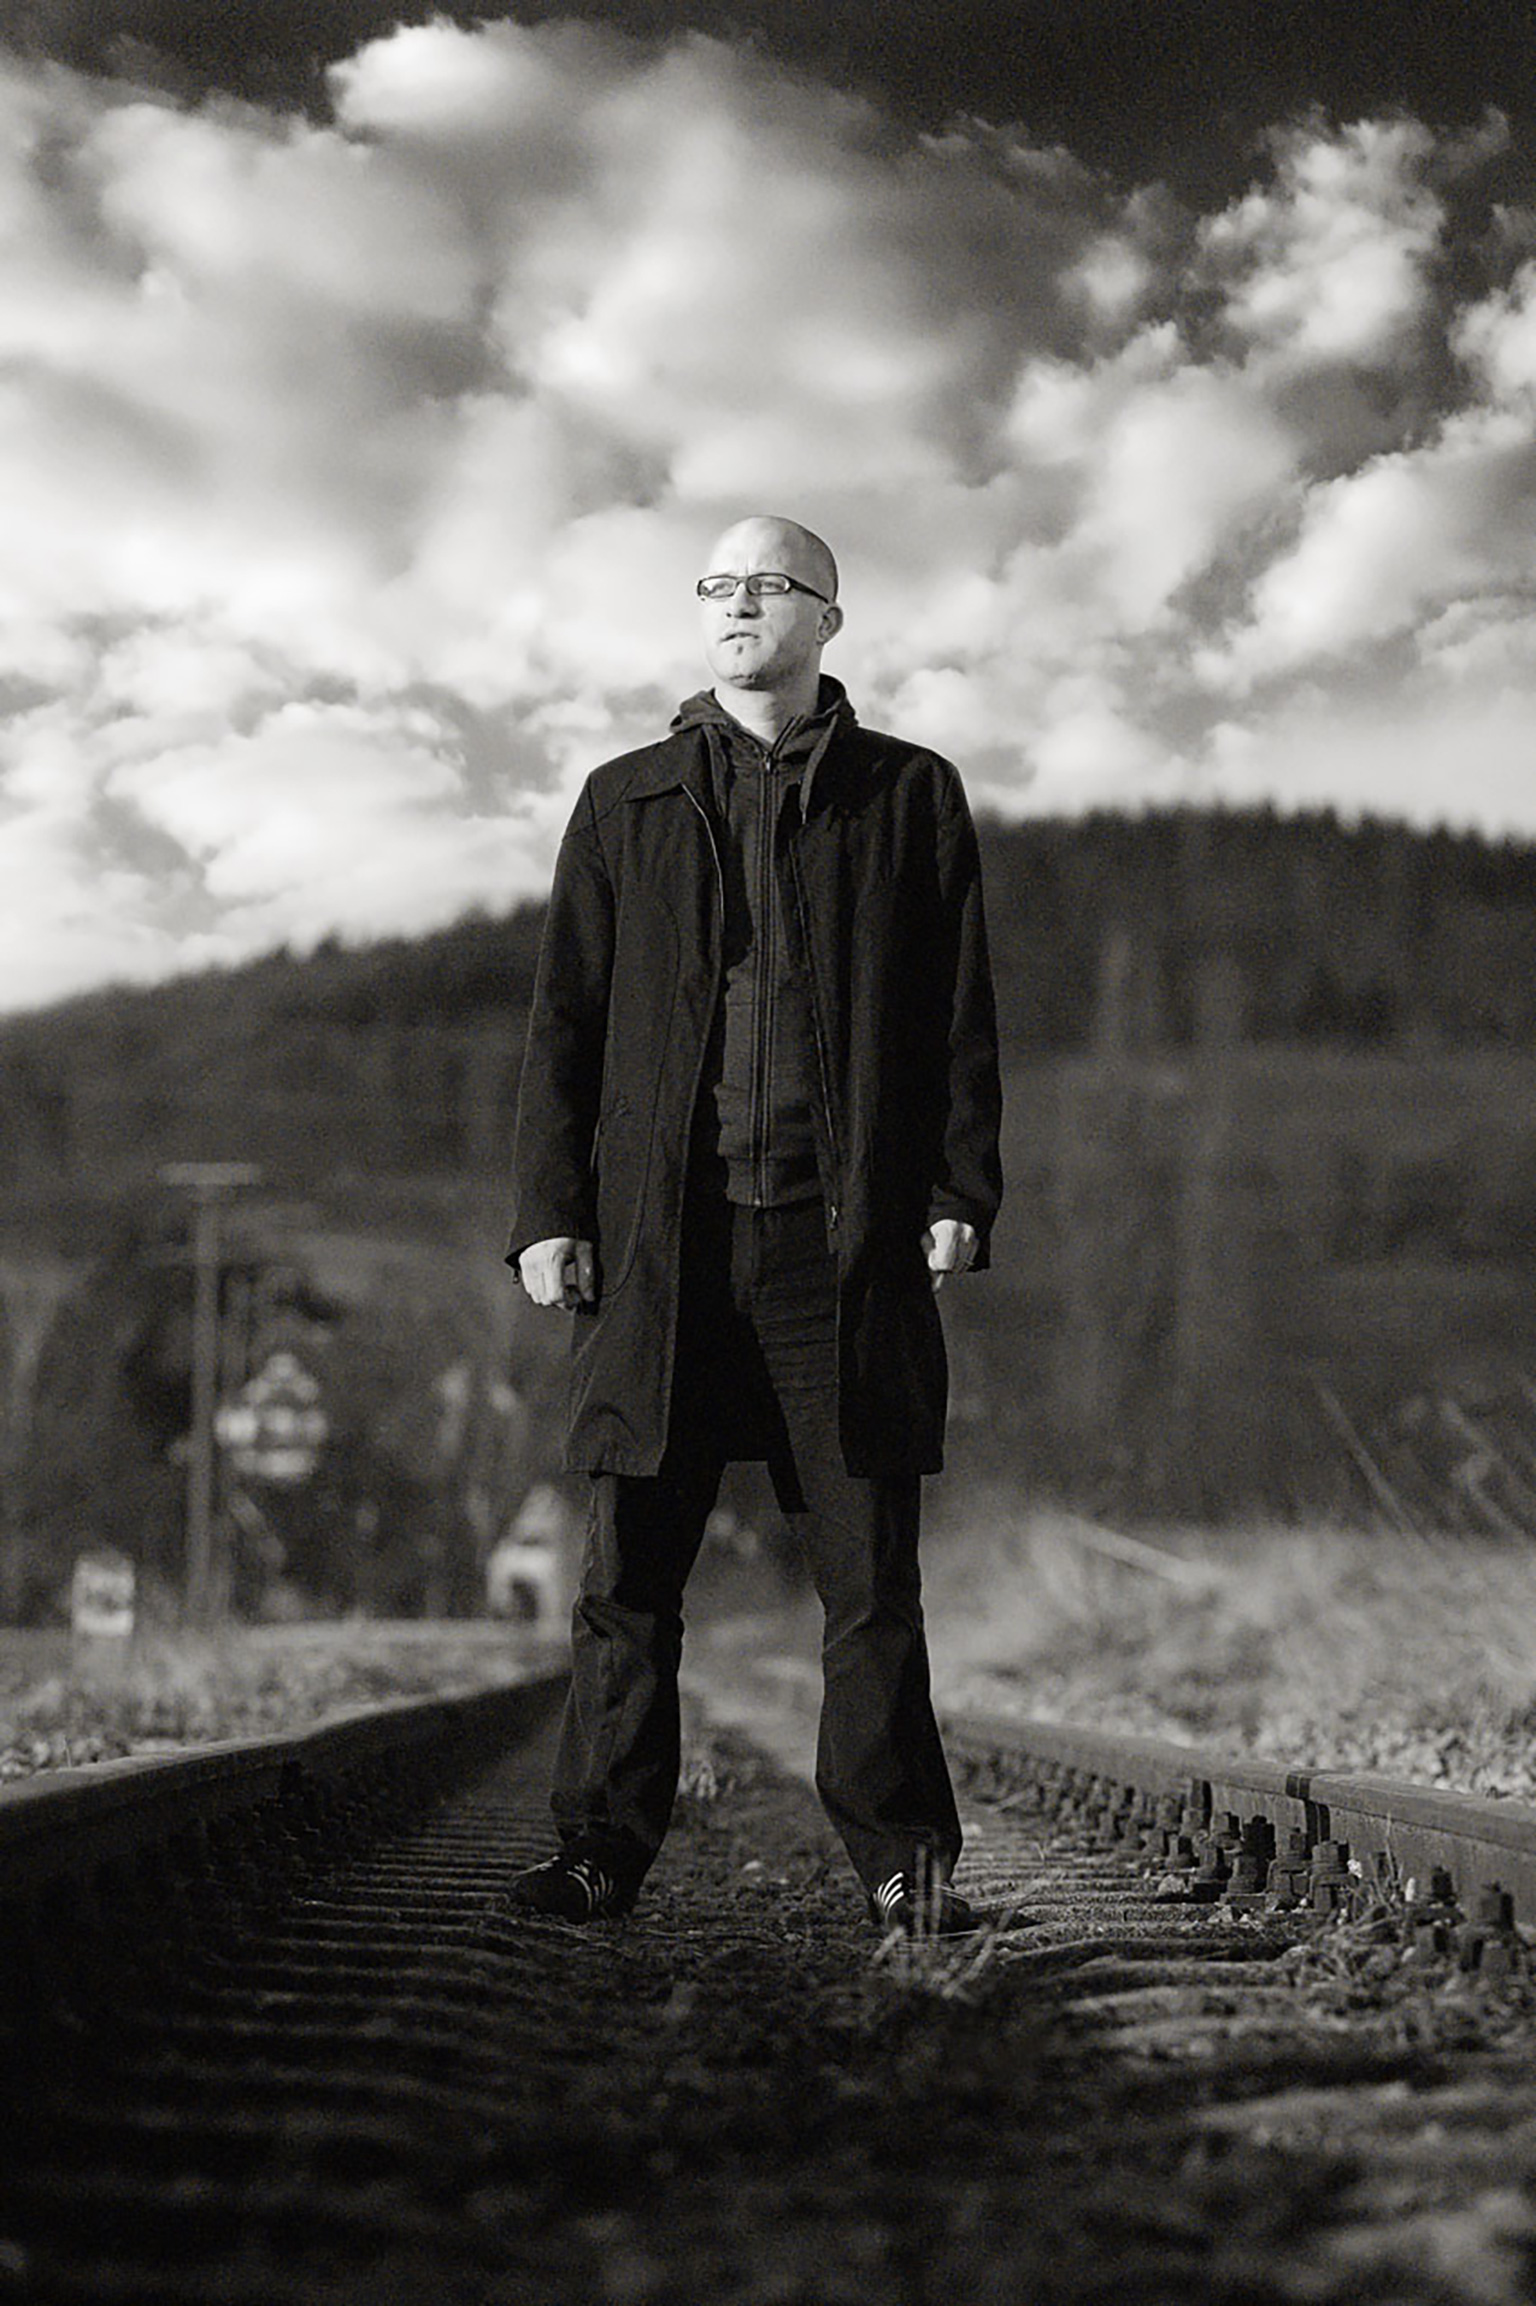 Sascha Armbruster Kandern 2009